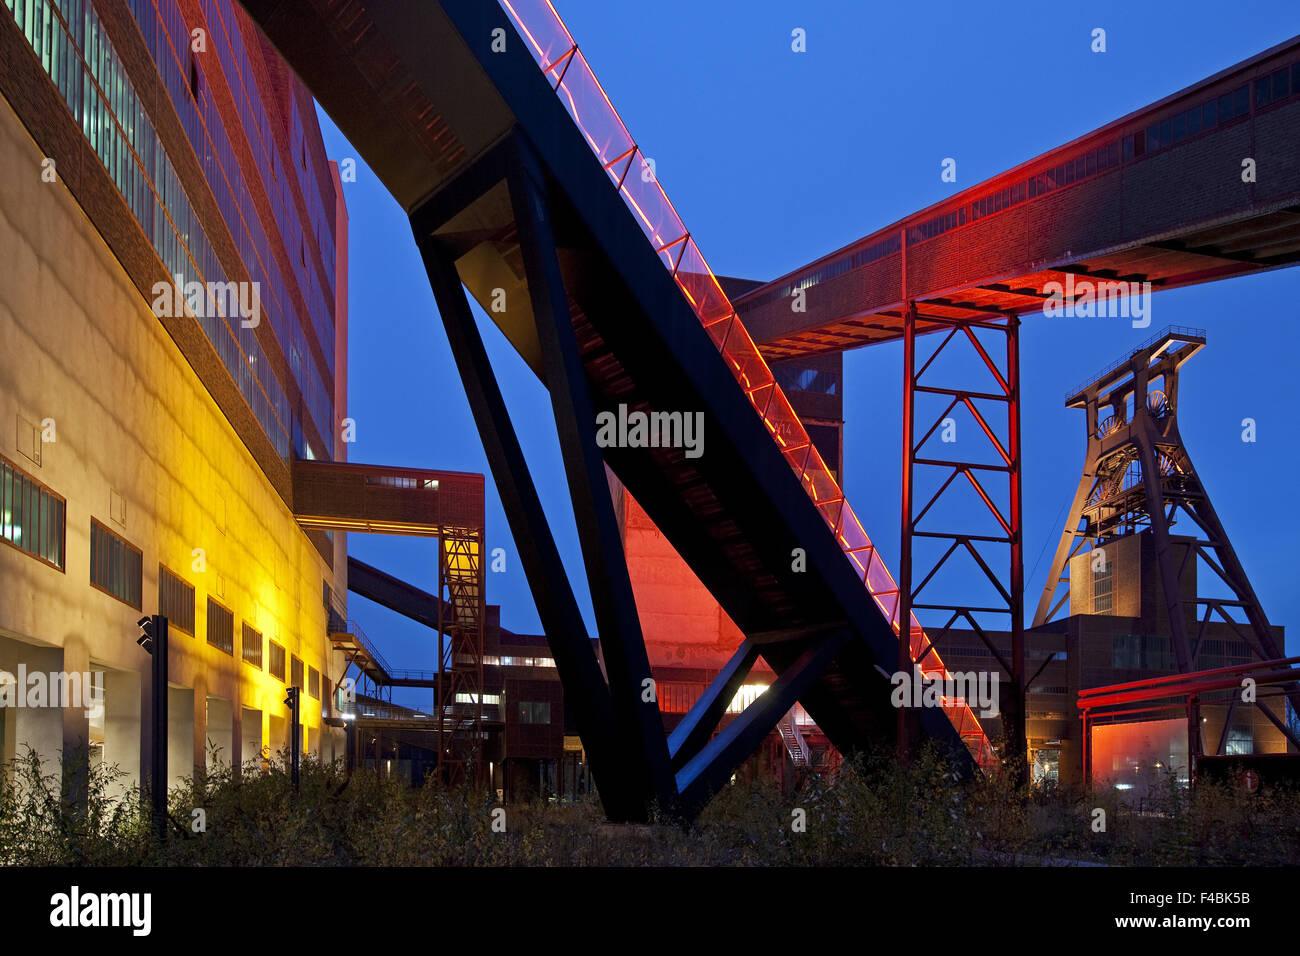 Zollverein with headframe, Essen, Germany. - Stock Image